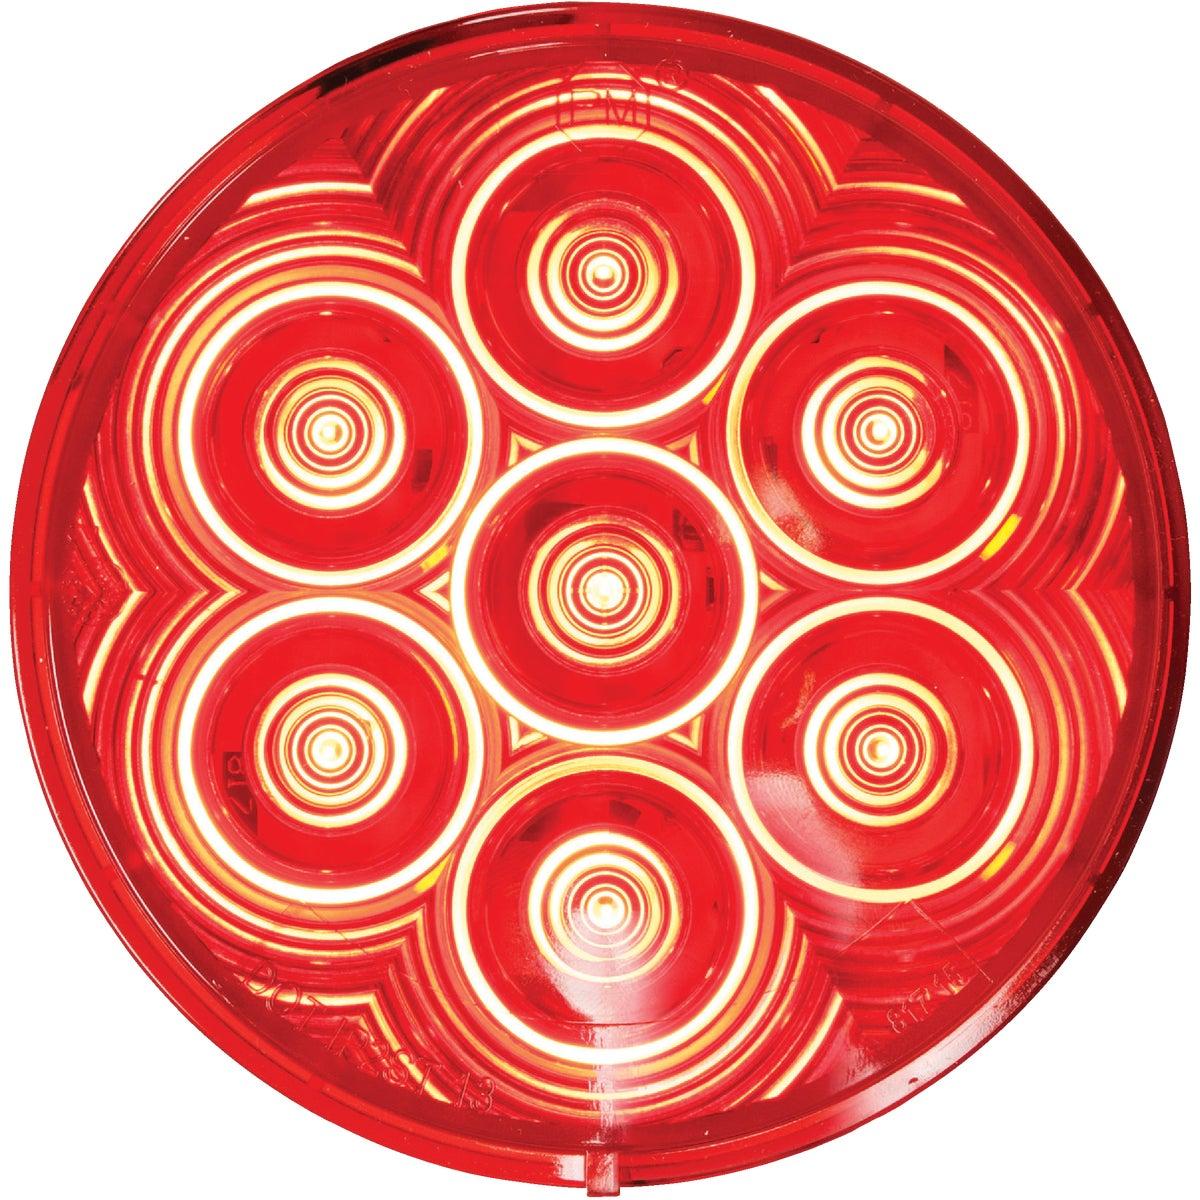 LED RED RND STOP LGT KIT - V826KR-7 by Peterson Mfg Co